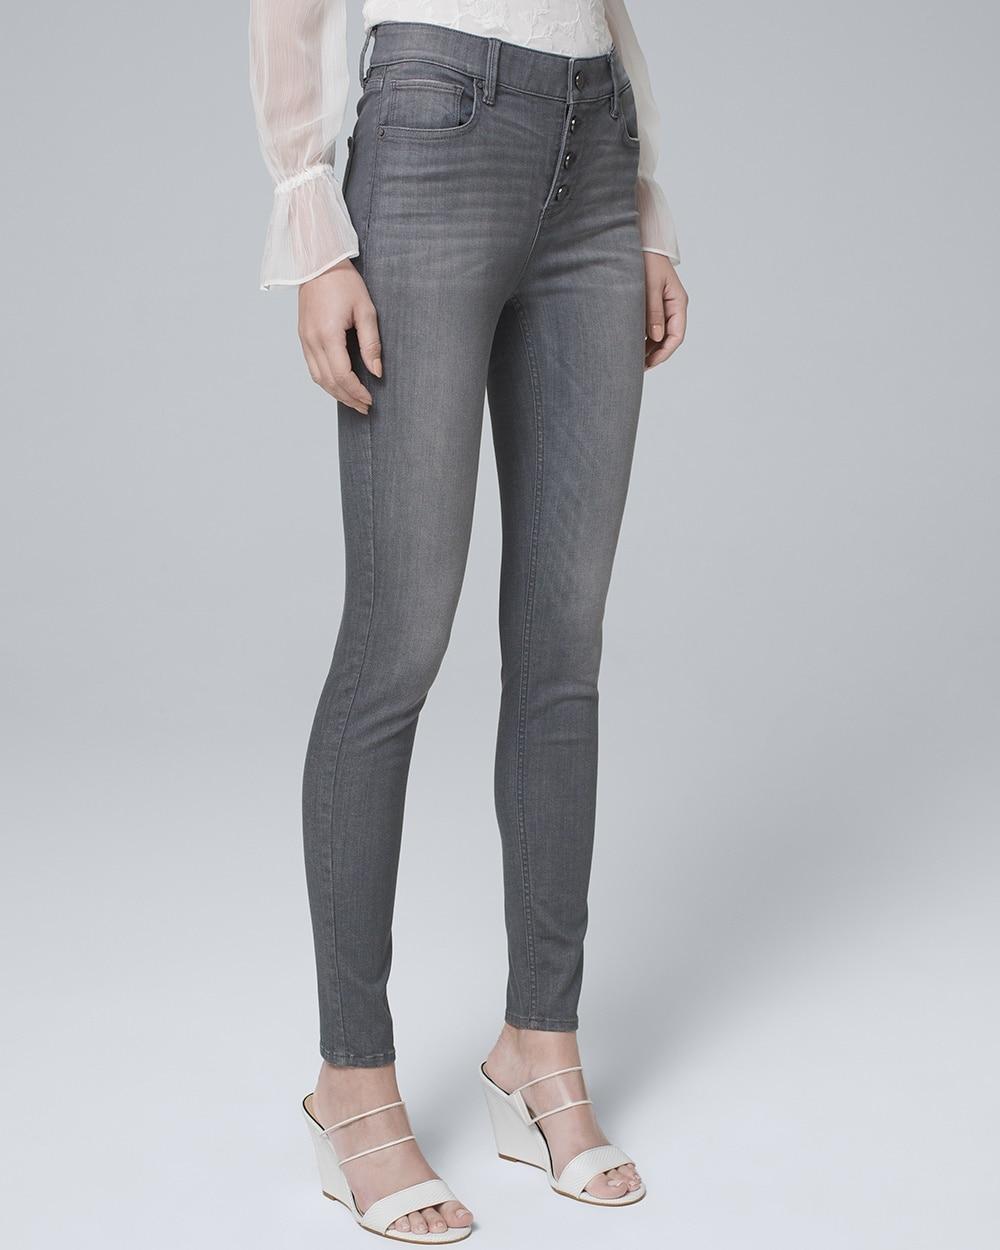 248da98faa7 Shop Jeans For Women - Skinny, Bootcut, Leggings & More - White ...